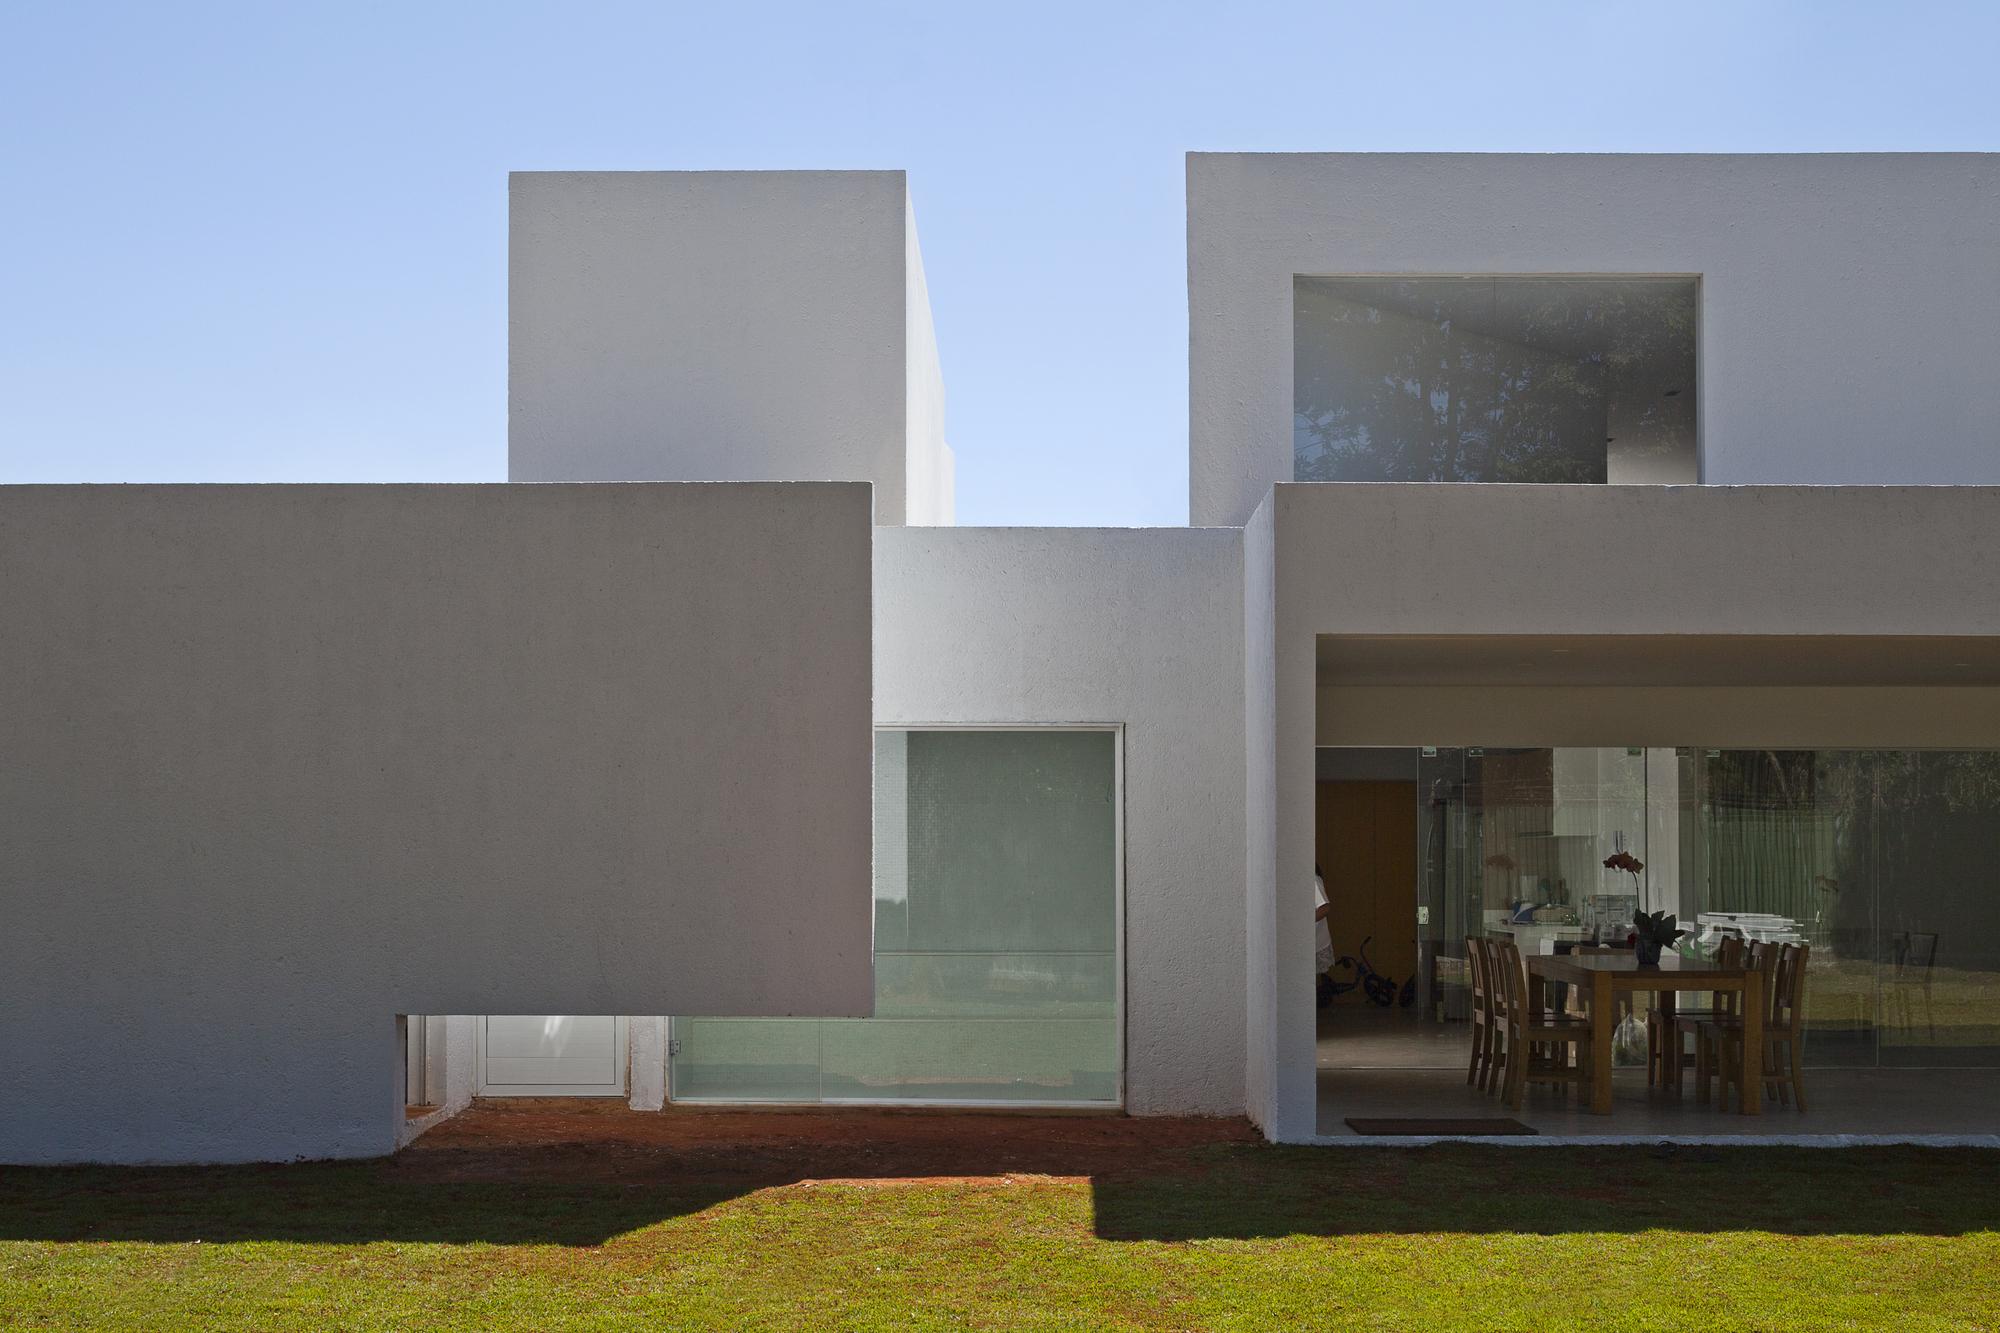 5226a31de8e44e03f400011b_migliari-guimar-es-house-domo-arquitetos__mg_1508_foto_haruo_mikami.jpg